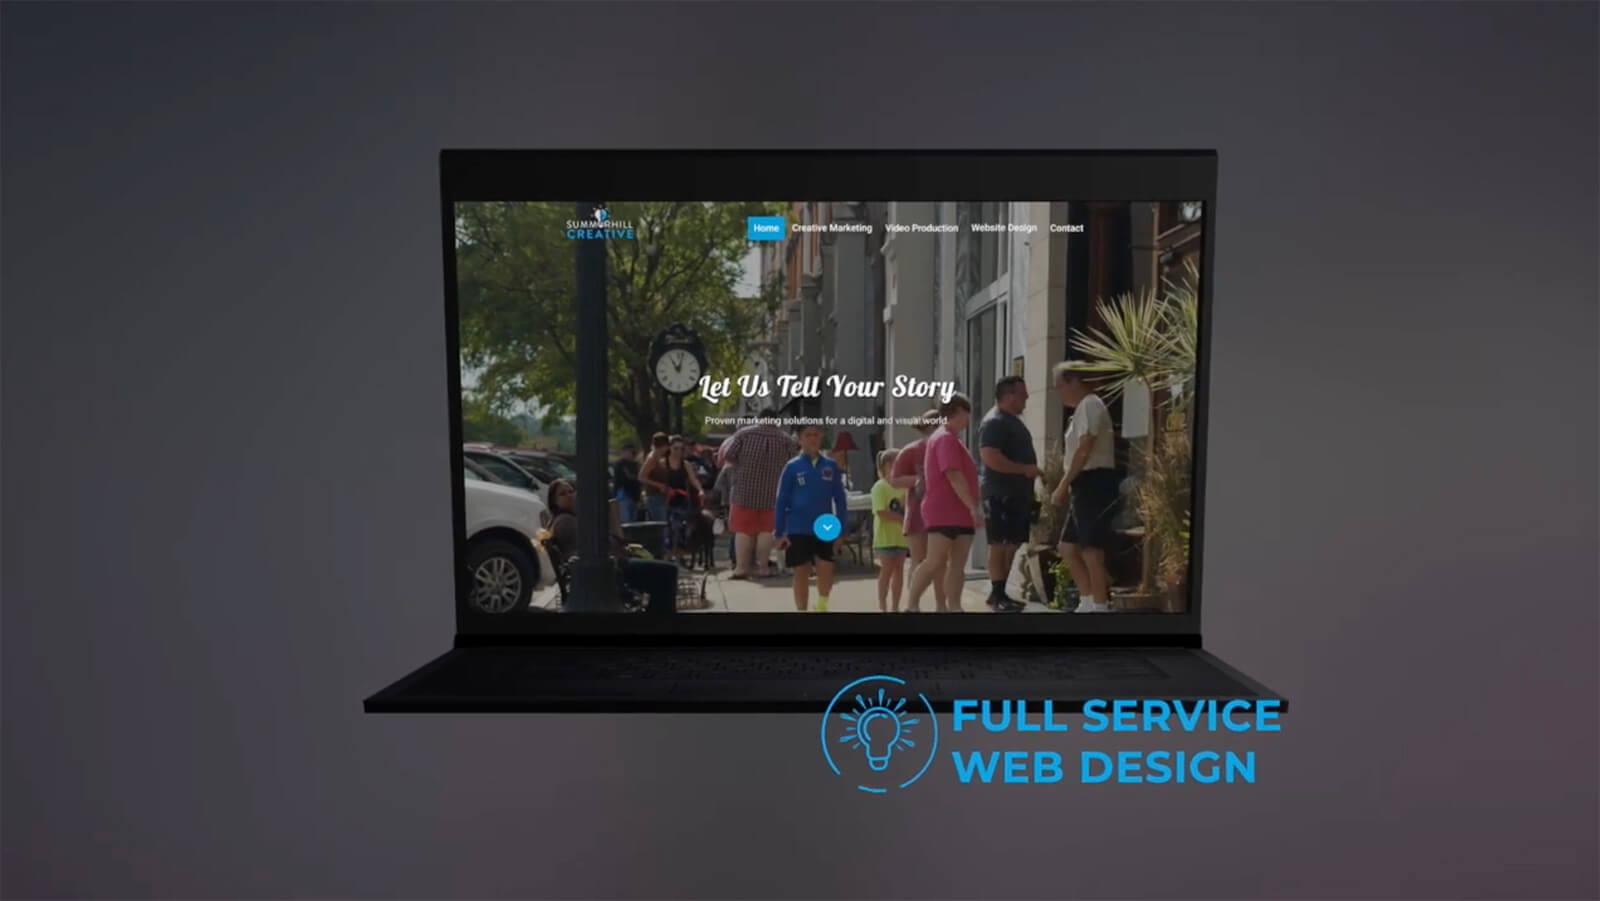 website design video image-summerhill creative